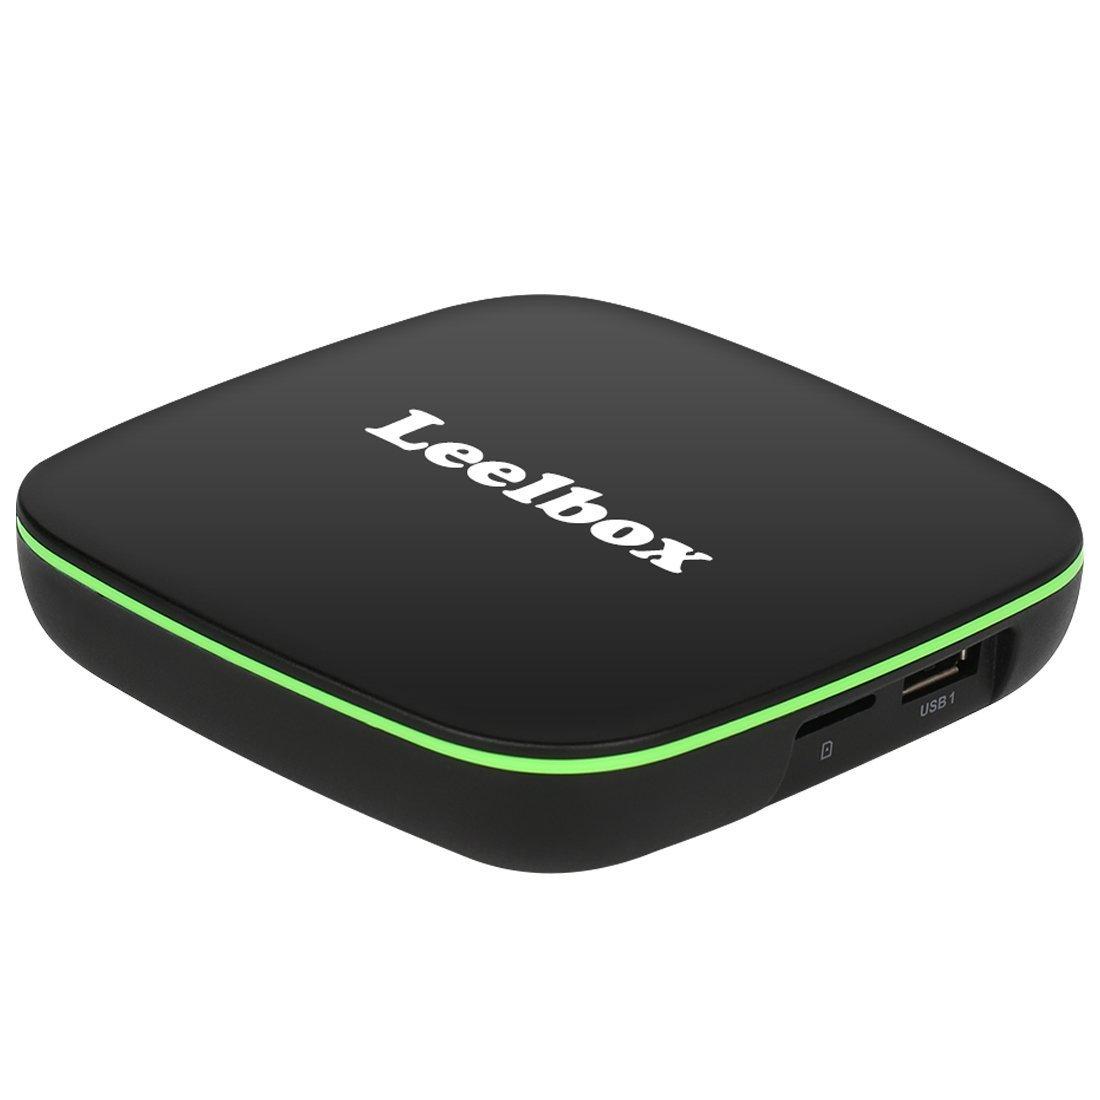 Leelbox Q Android TV Box Smart TV Box Quad core Android